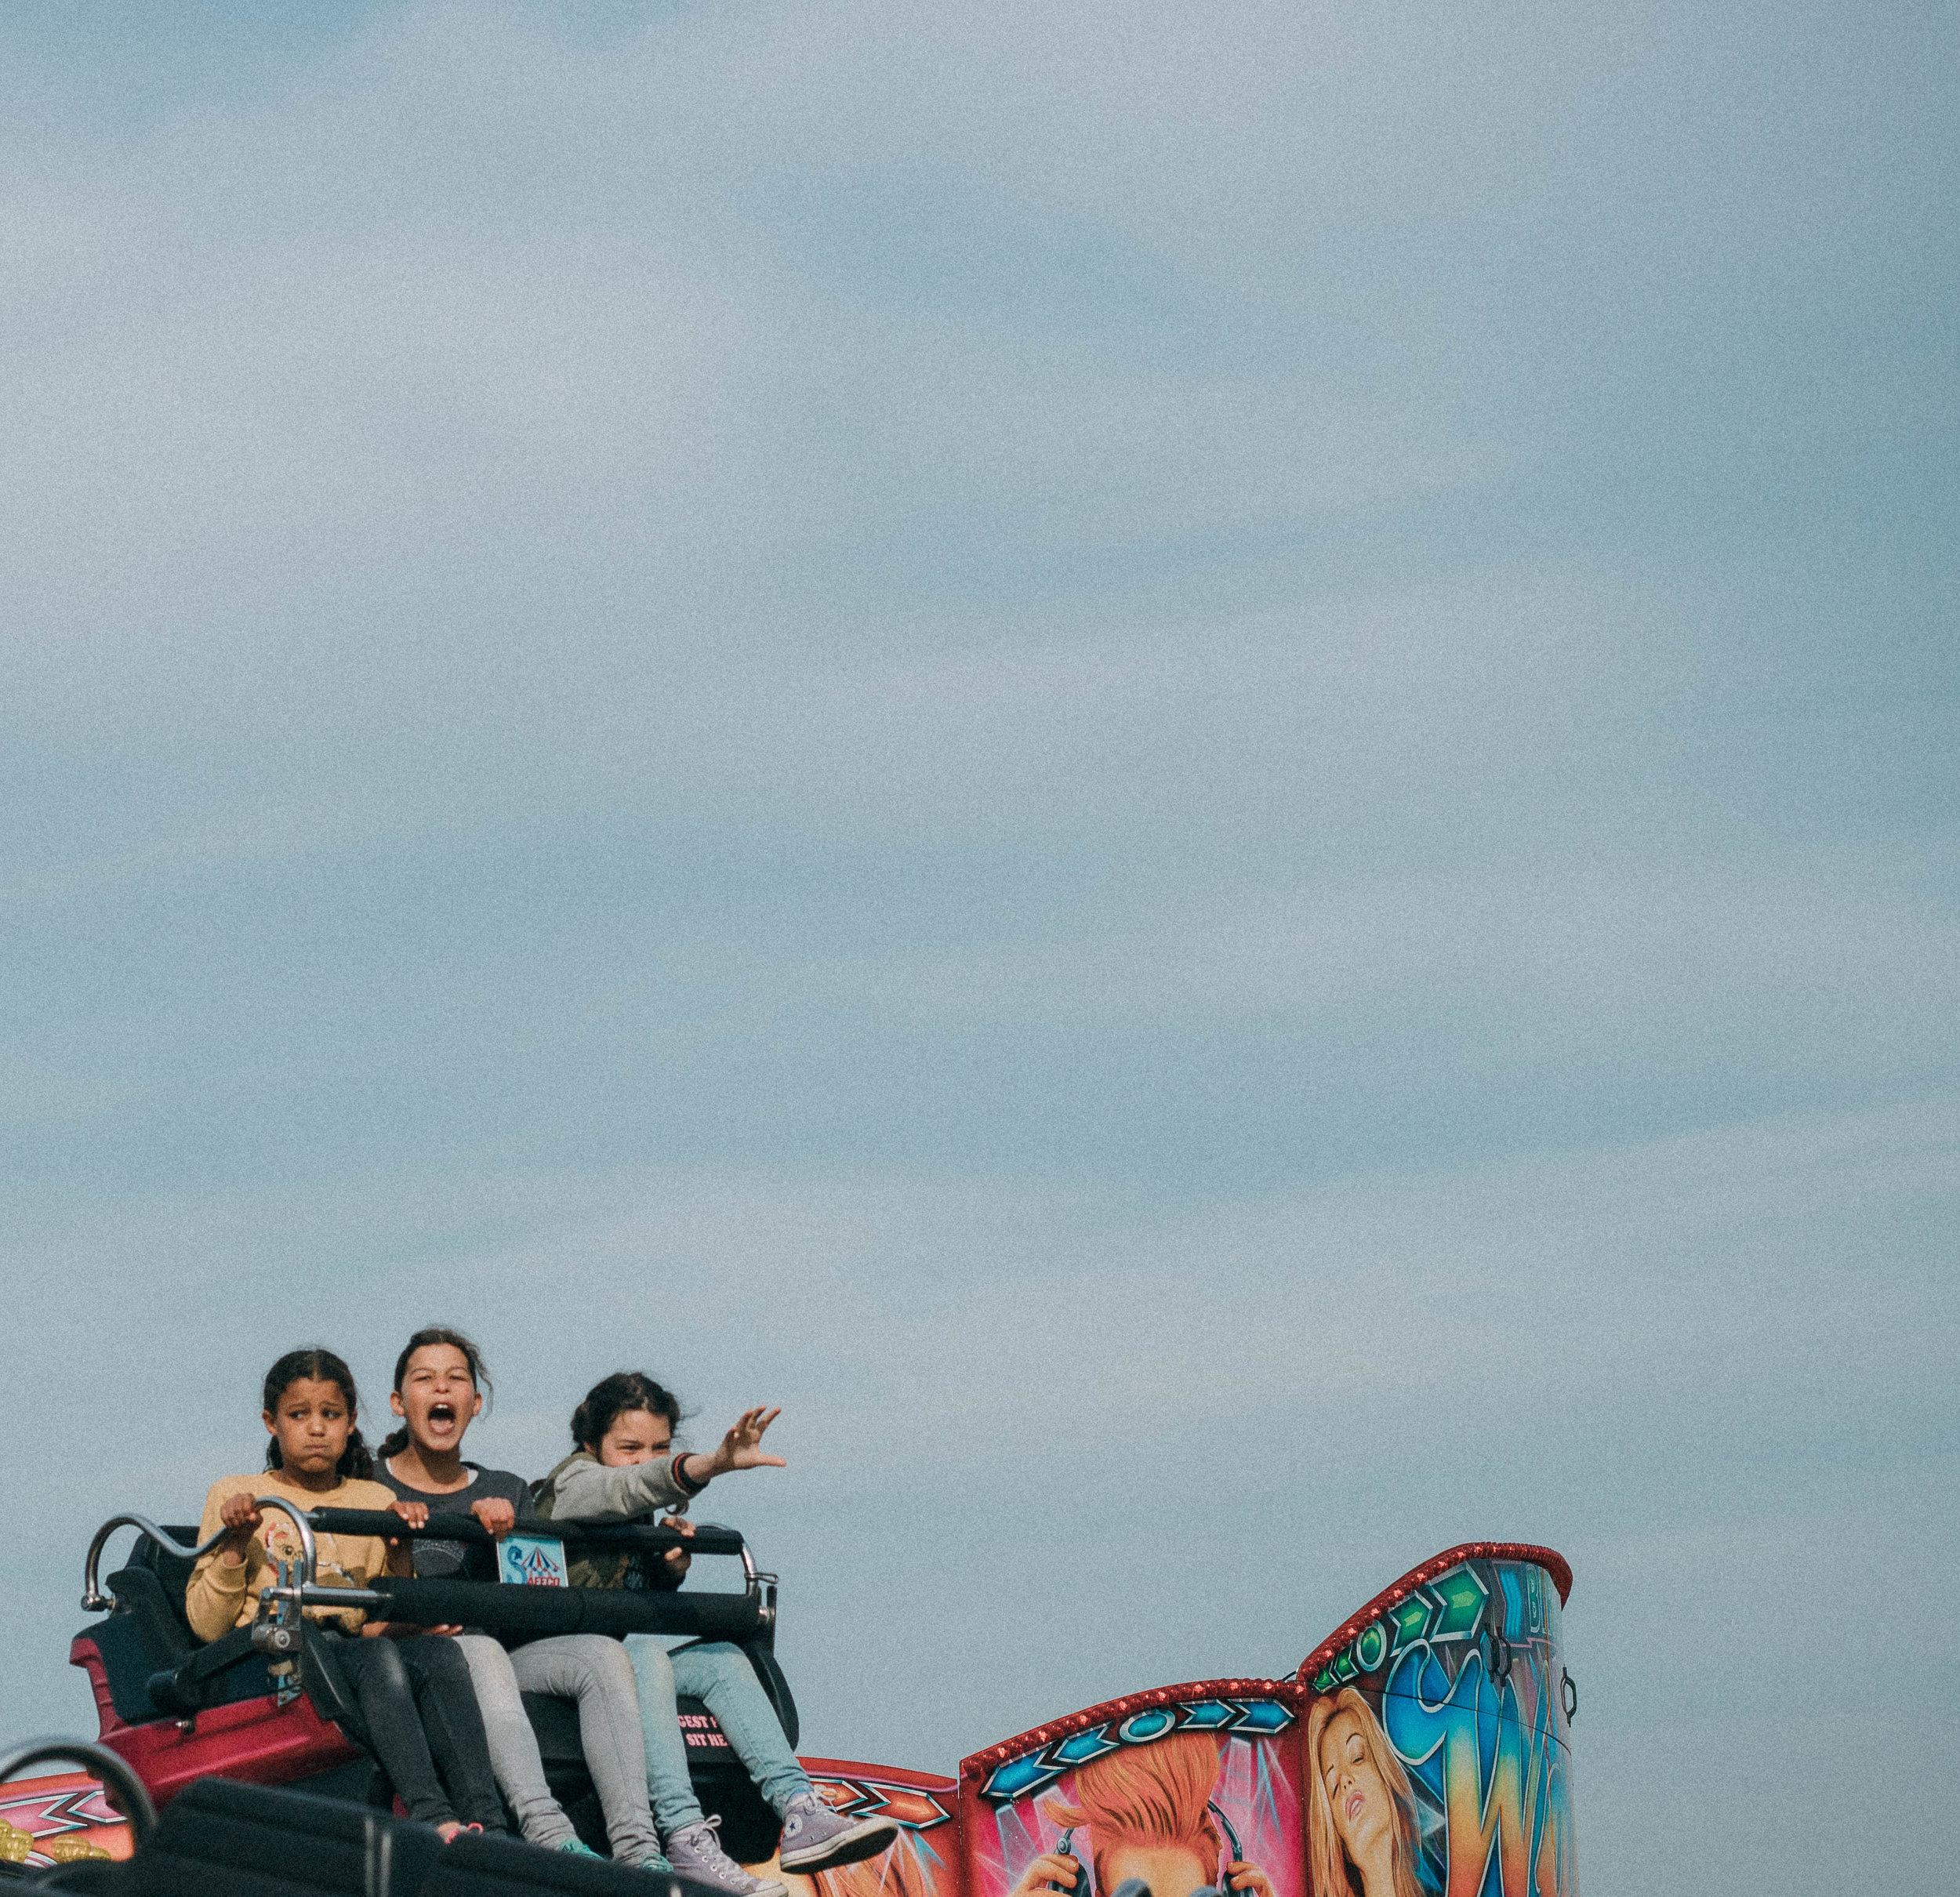 fairground-2.jpg